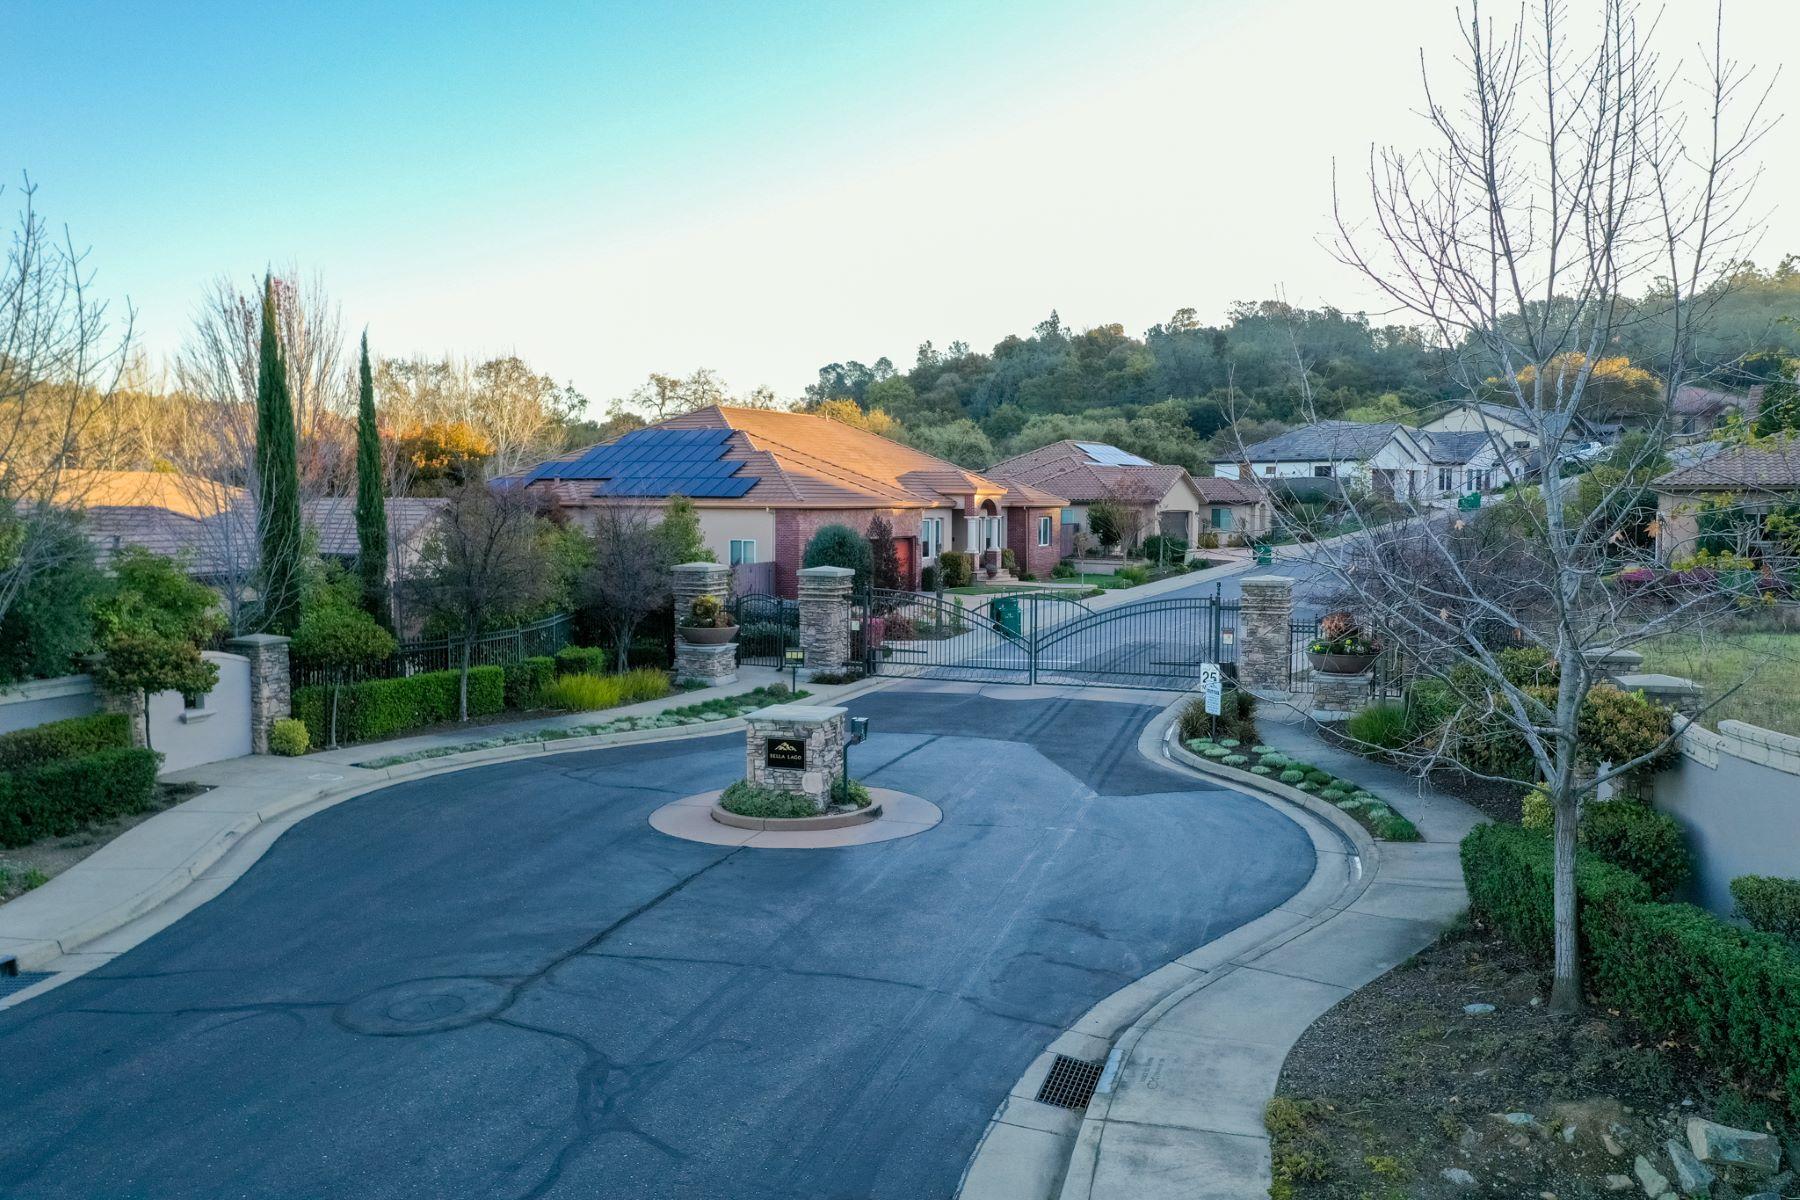 Land for Sale at 3111 Corsica, El Dorado Hills, CA, 95762 3111 Corsica El Dorado Hills, California 95762 United States